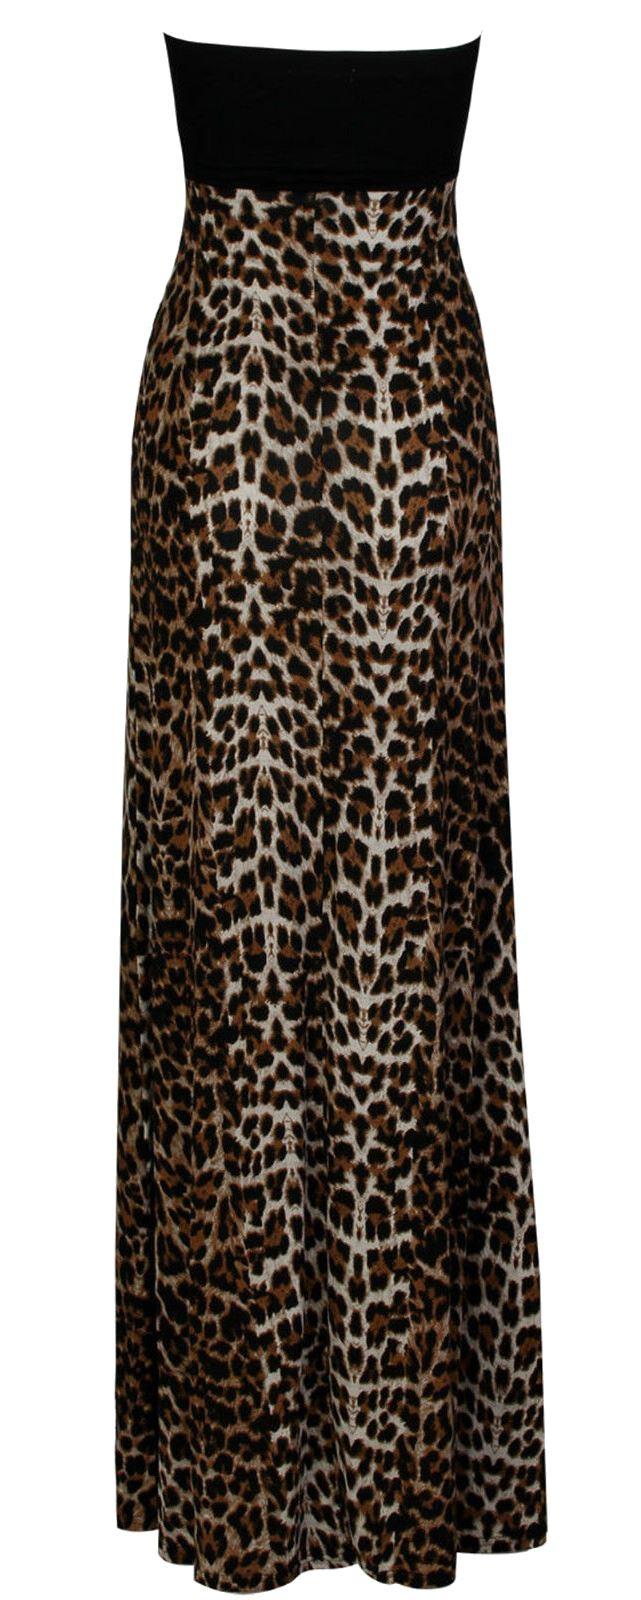 New-Womens-Plus-Size-Grecian-Boob-Animal-Print-Long-Maxi-Dress-8-26